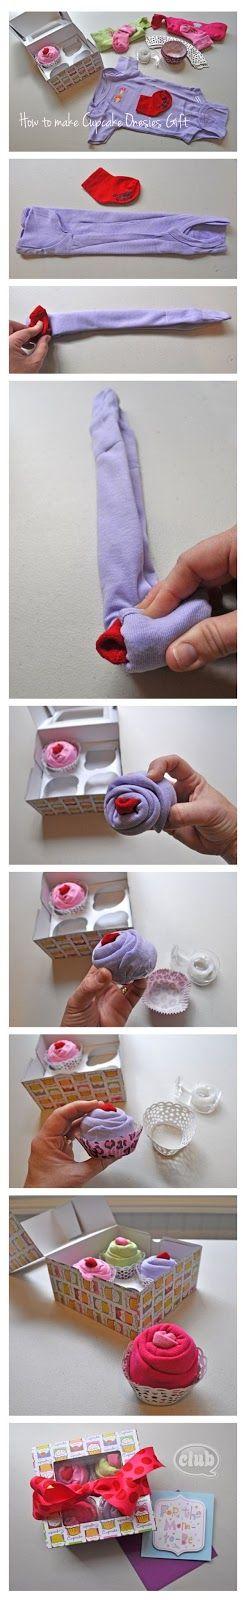 cupcake baby gift steps - I LOVE this idea - so cute!